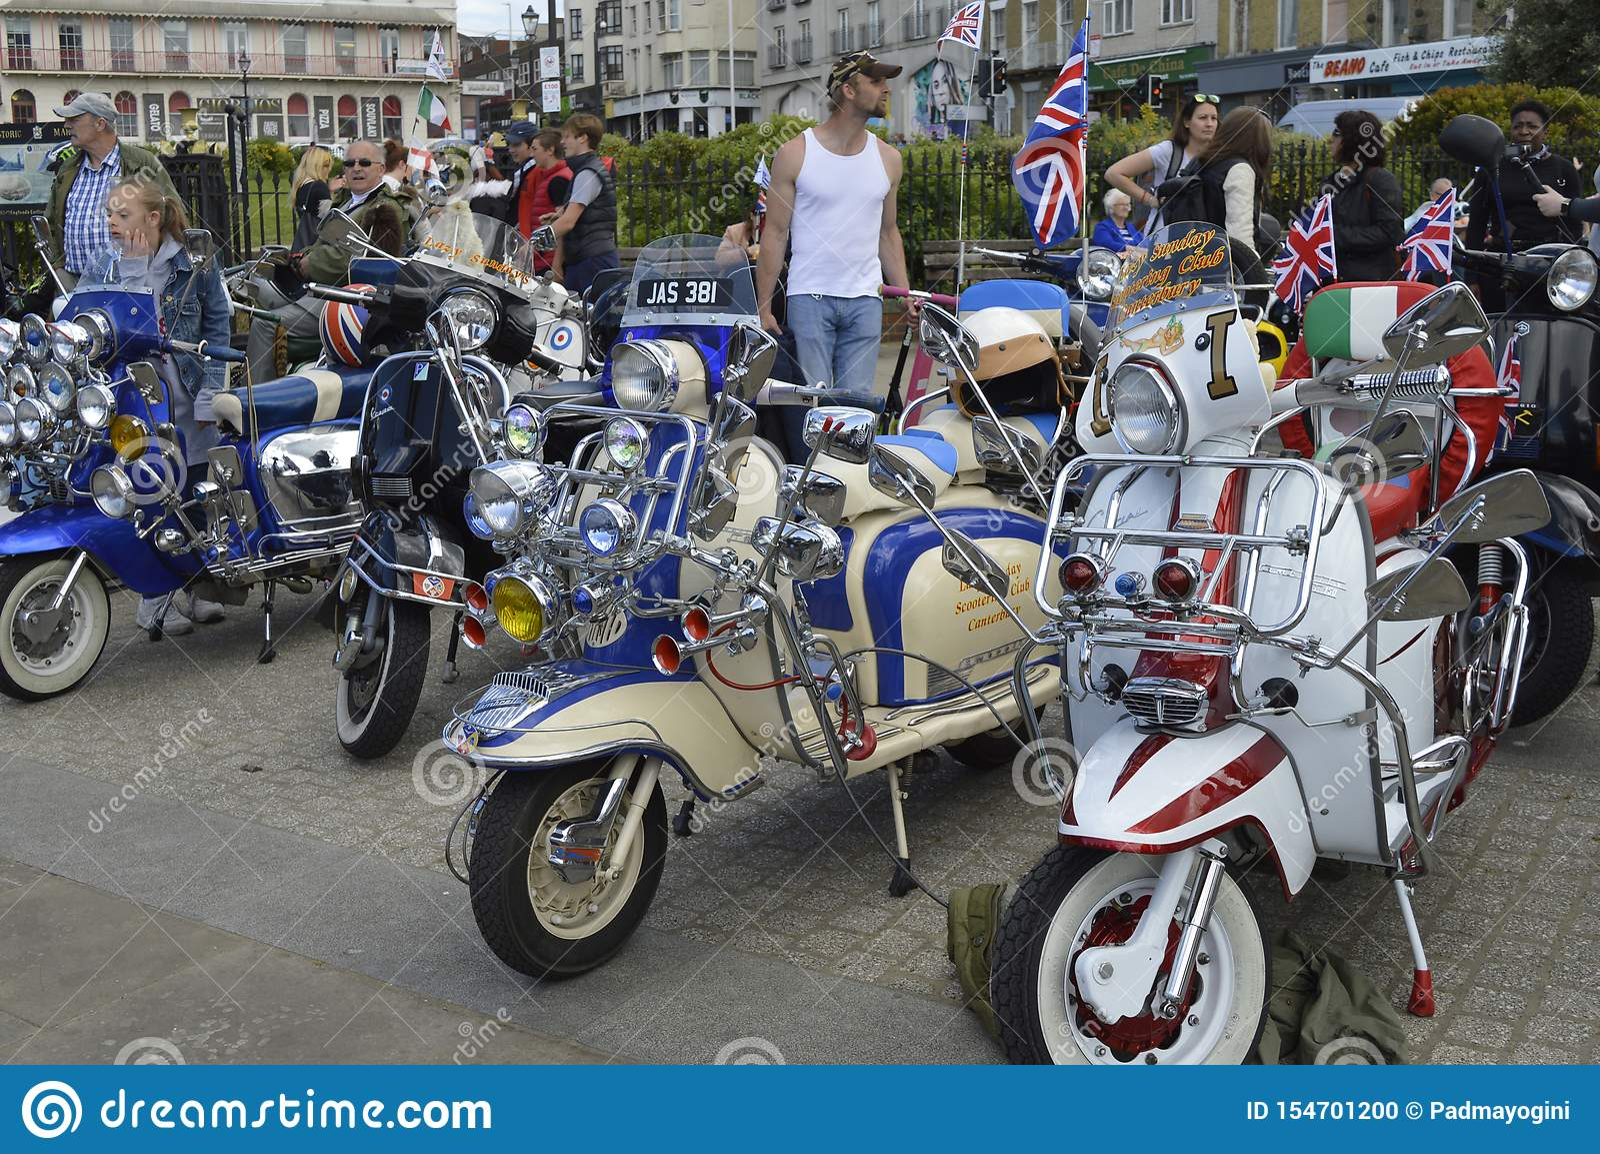 Visitors admire motorbikes at Margate Meltdown annual bike ride.